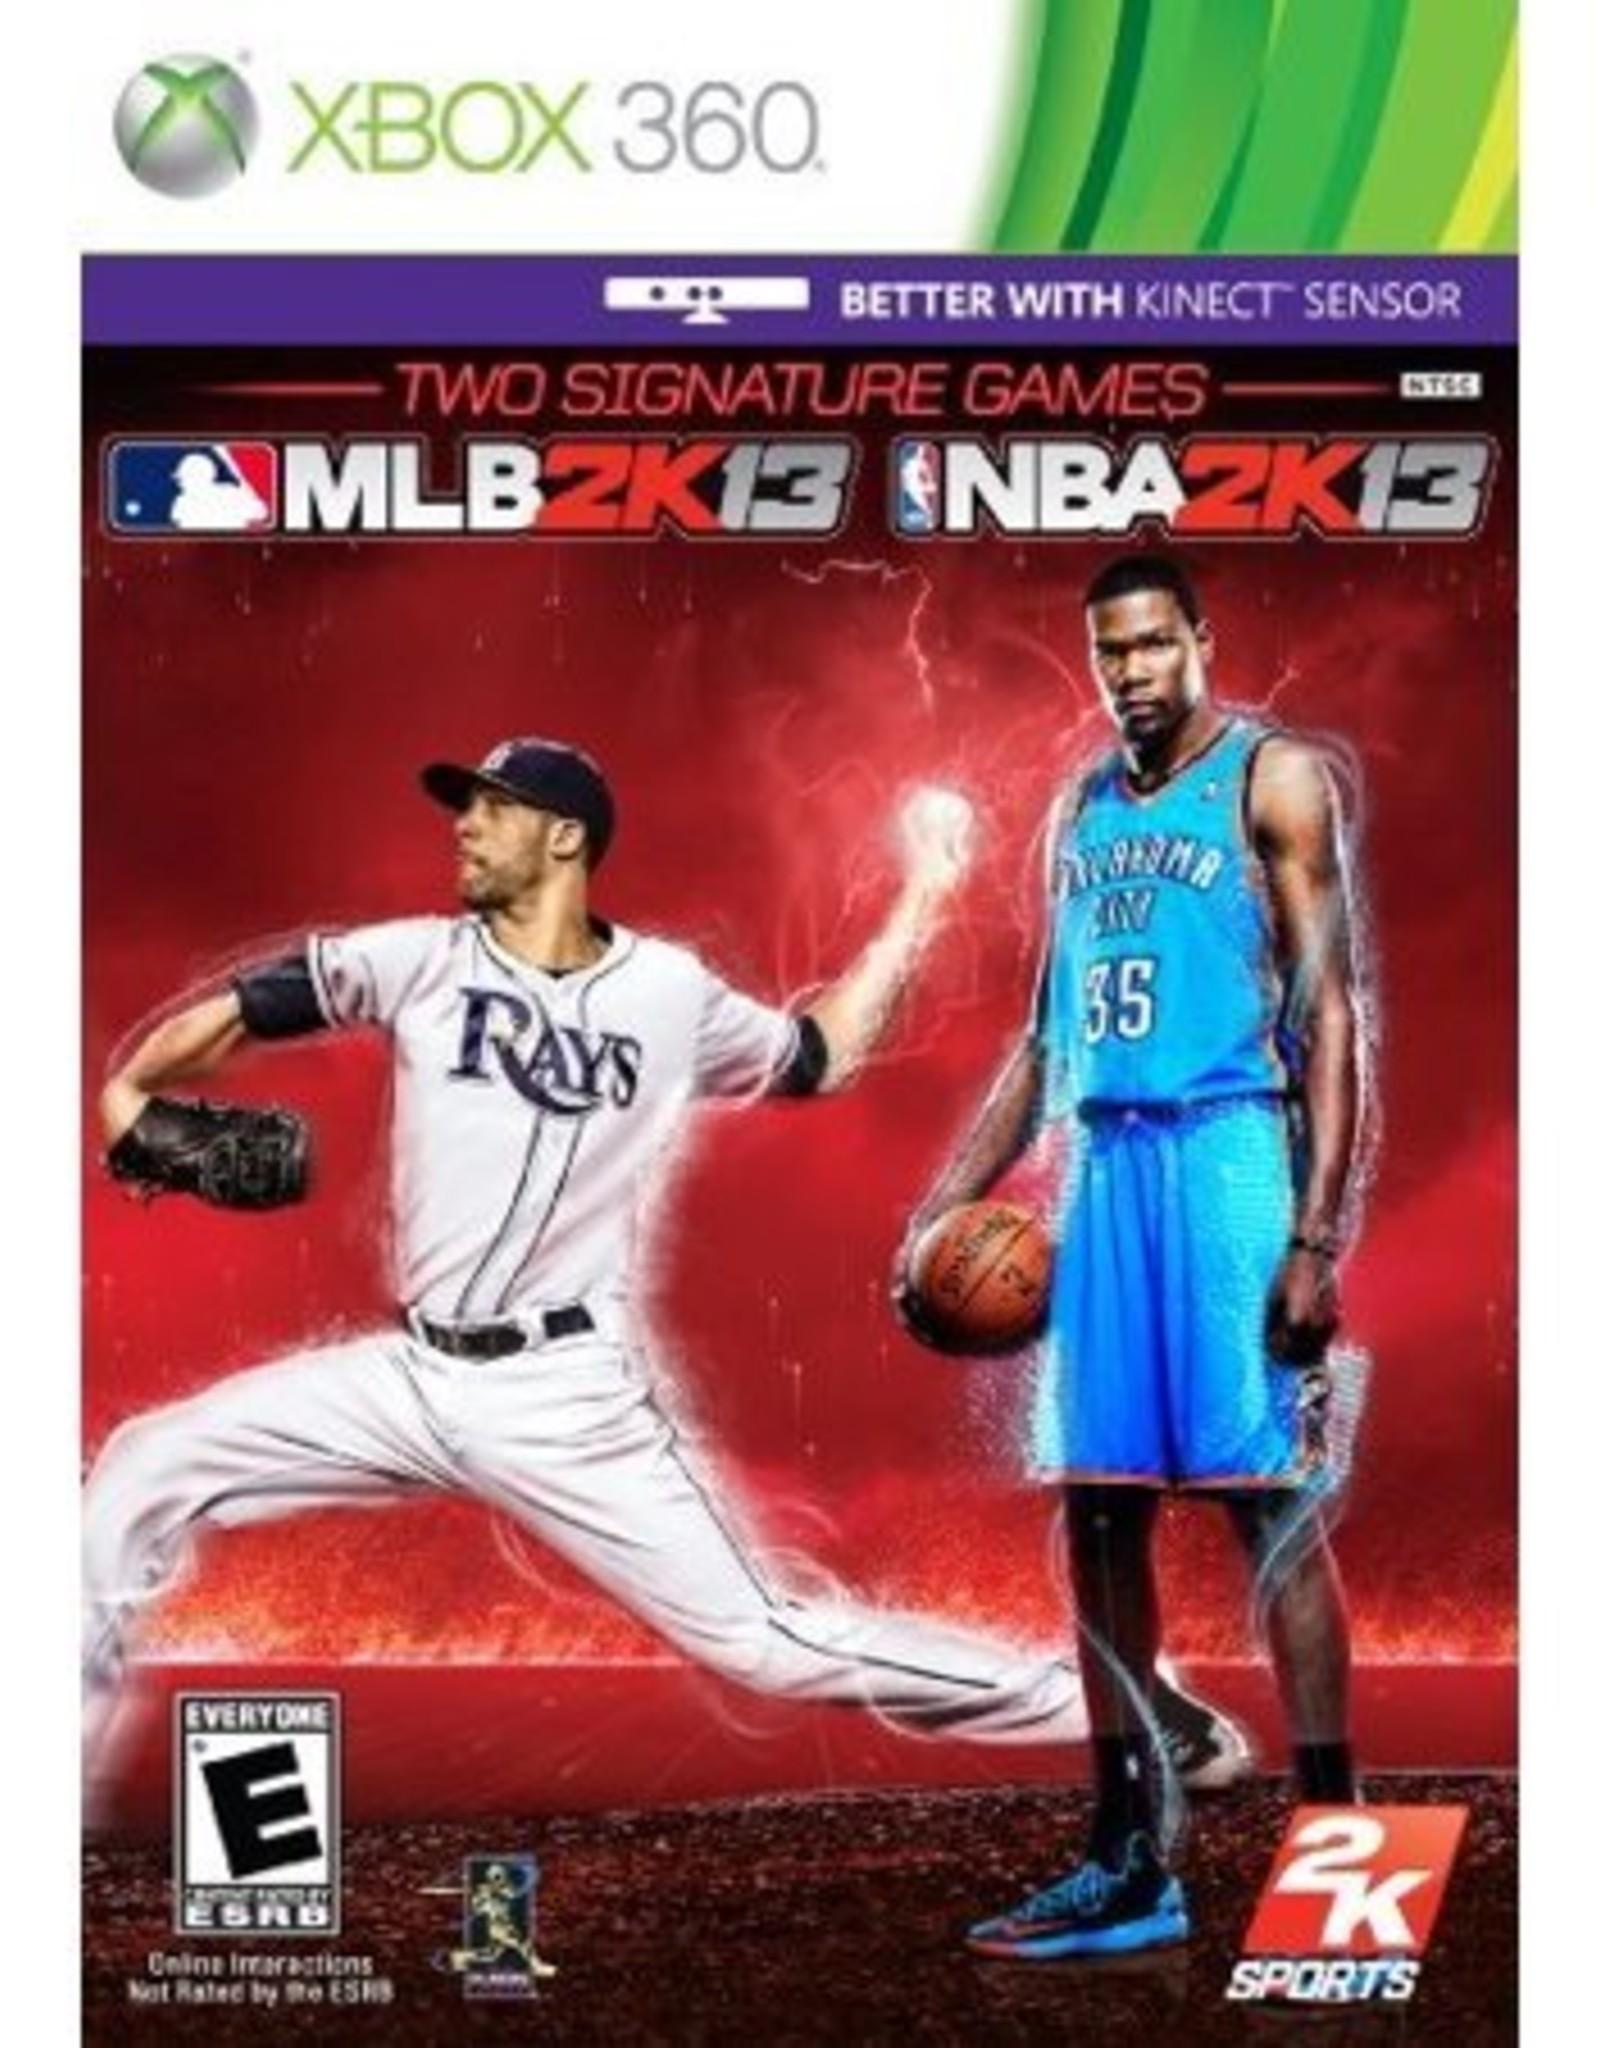 MLB 2k12 + NBA 2K12 Combo Pack - XB360 PrePlayed